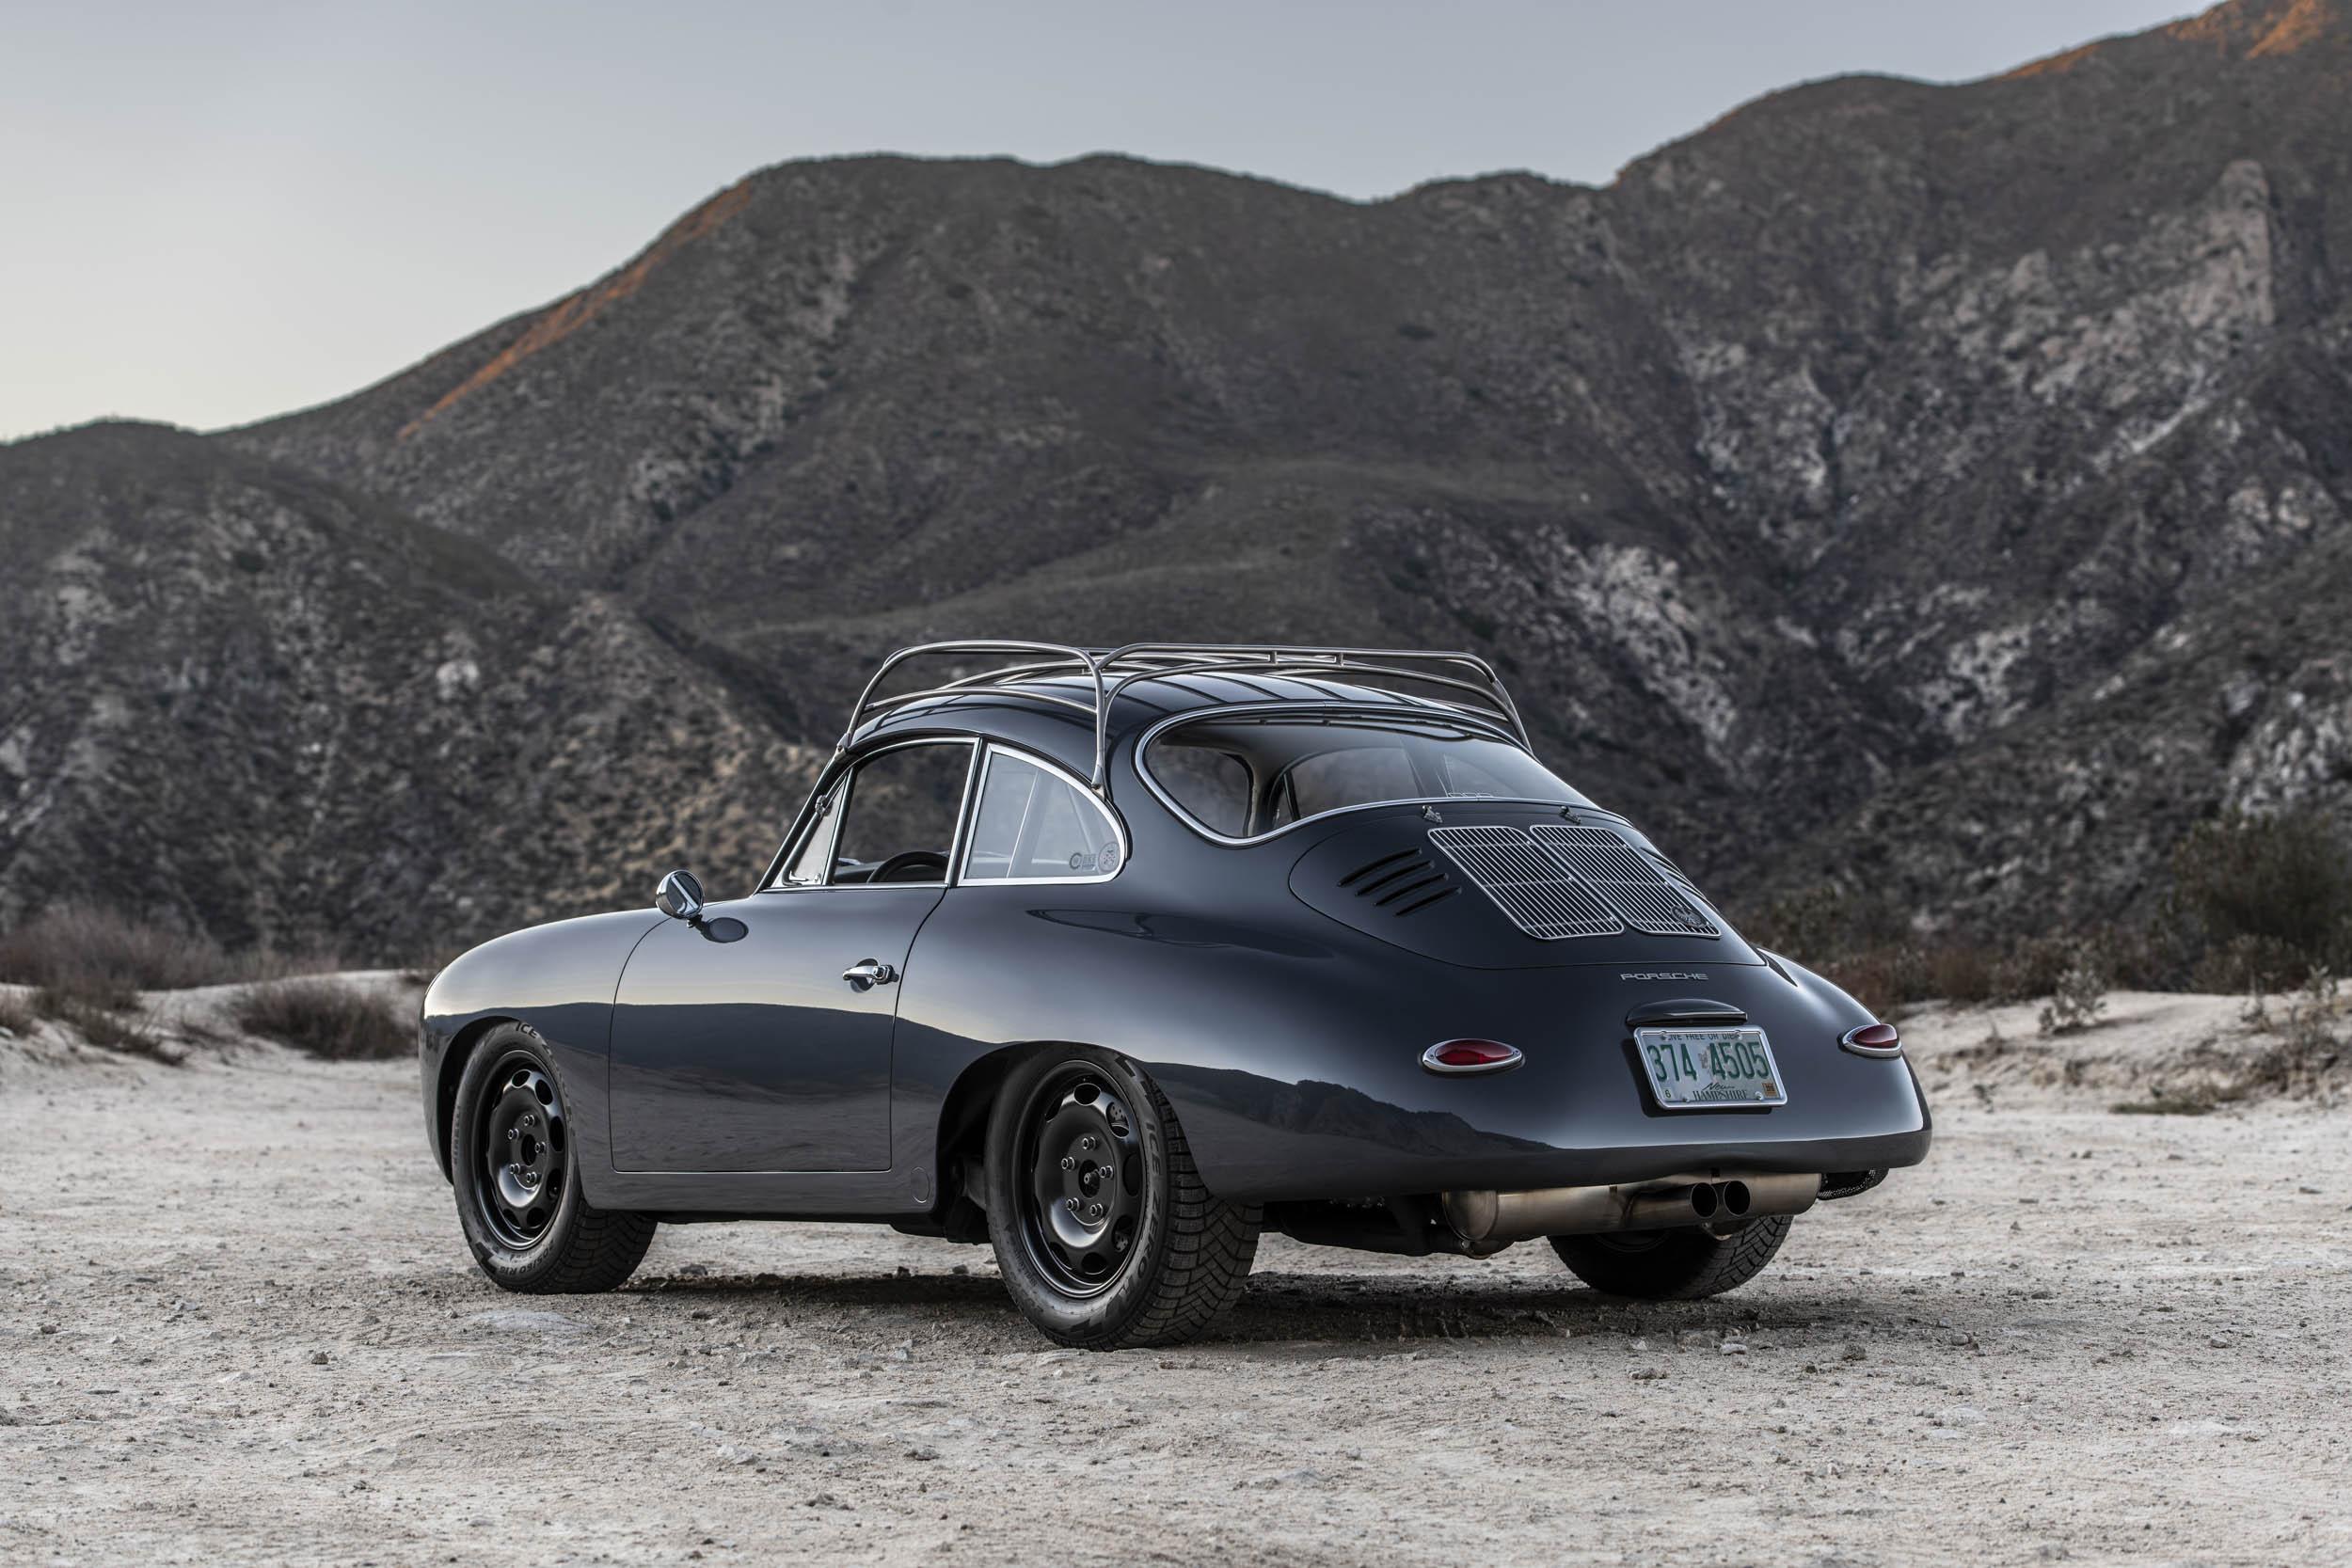 static Emory Porsche 356 C4S Allrad rear 3/4